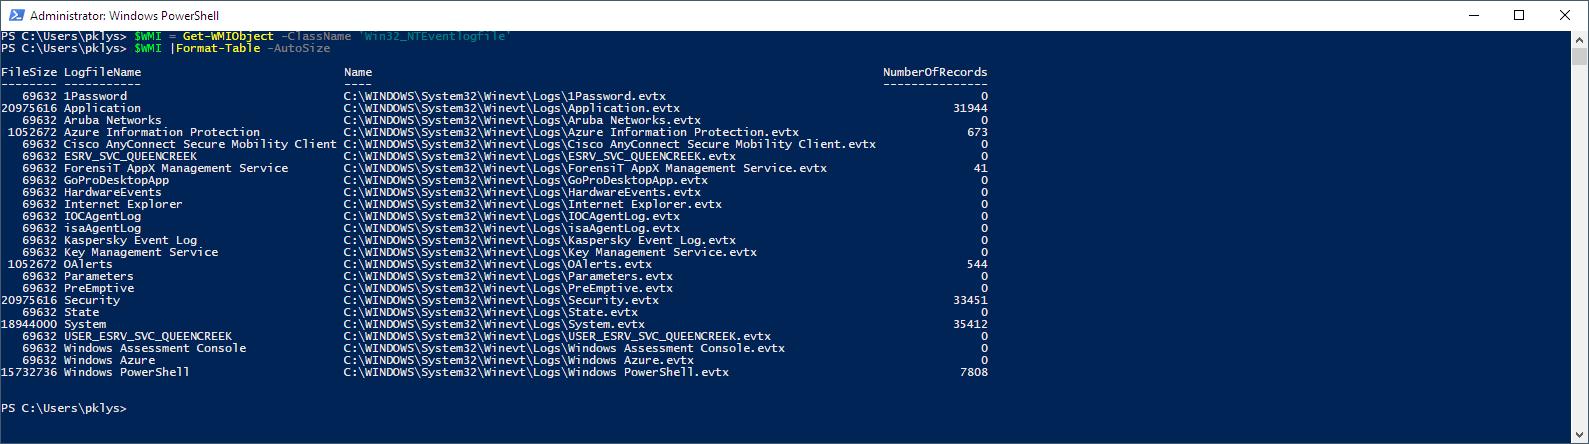 Get-WMIObject -ClassName 'Win32_NTEventlogfile'